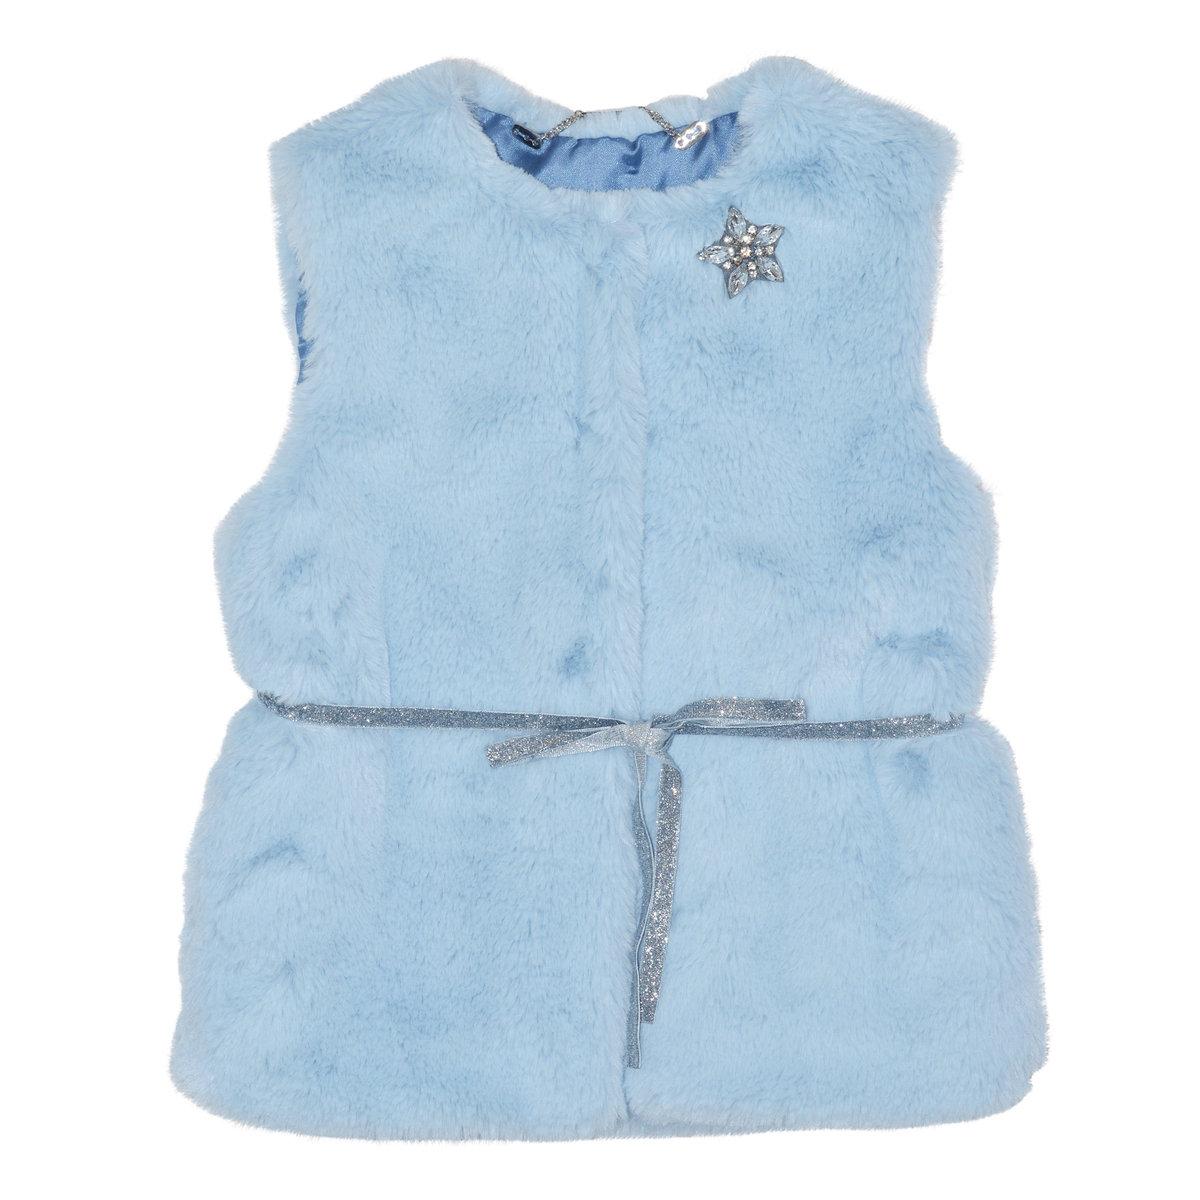 Little Girls Blue Faux Fur Vest | Microbe by Miss Grant Jackets ...